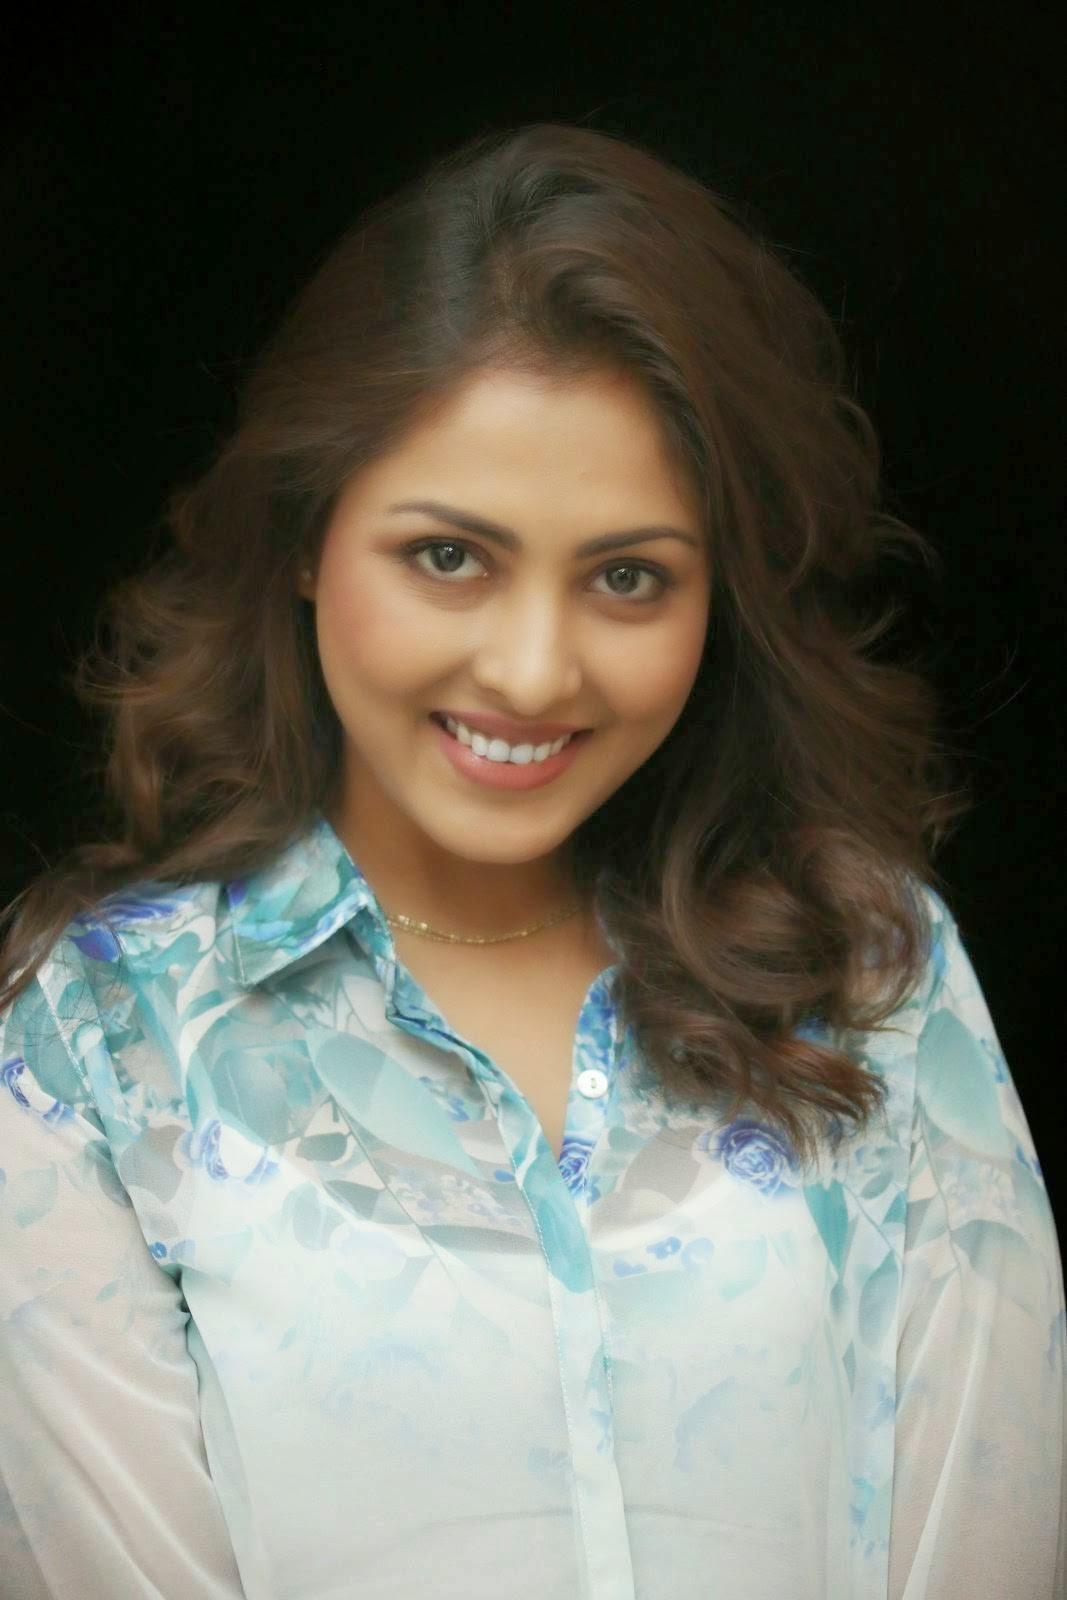 Actress Madhu Shalini Photo Gallery, Madhu Shalini Hot Face Close up images